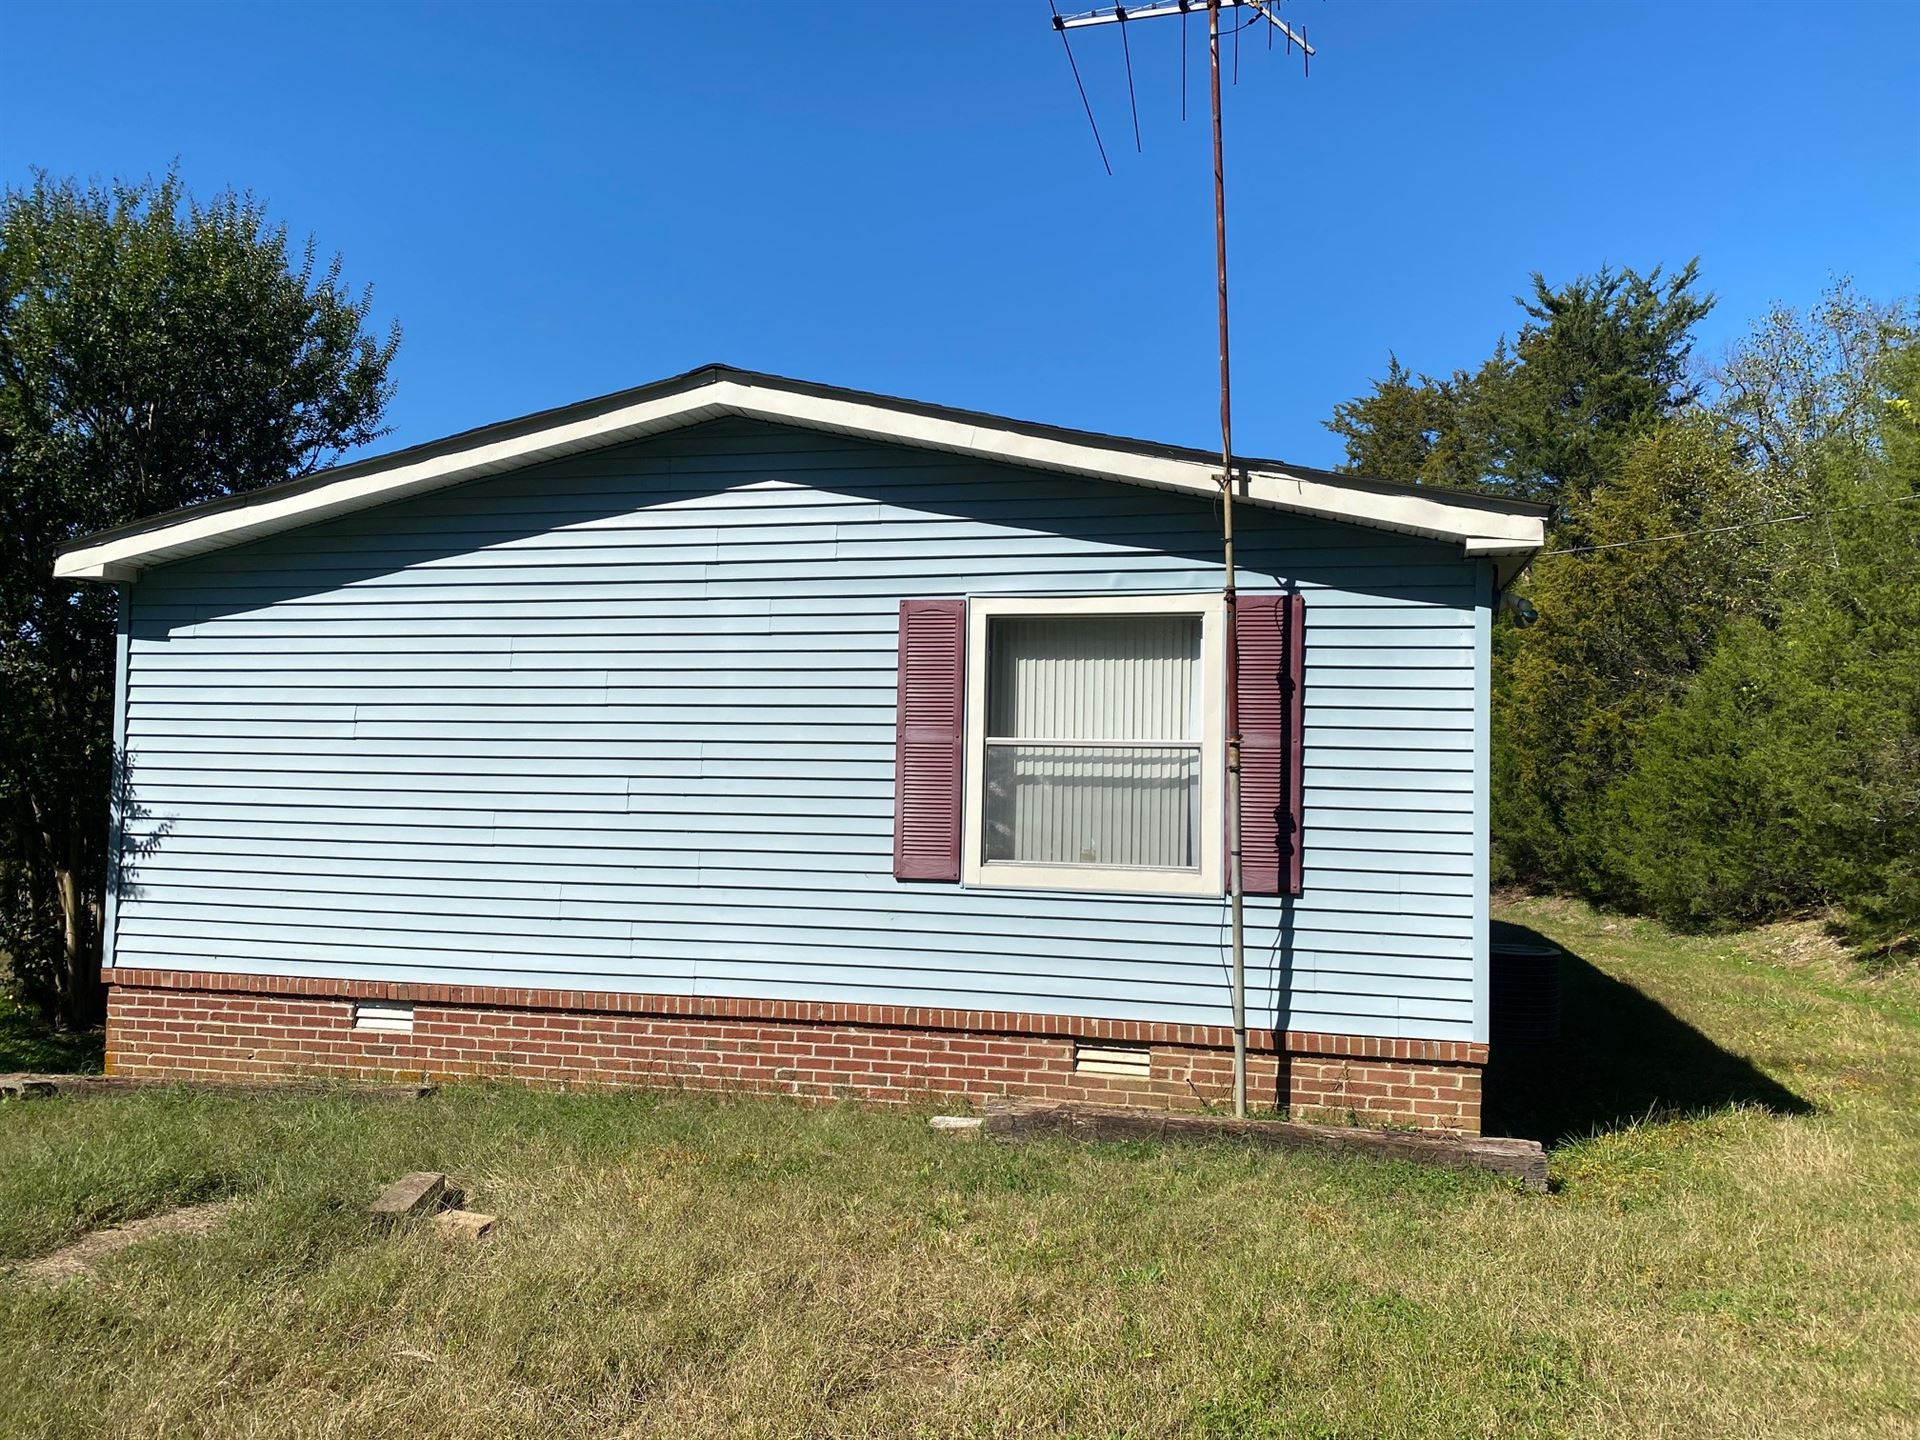 Photo of 5662 Columbia Hwy N, Pulaski, TN 38478 (MLS # 2198940)